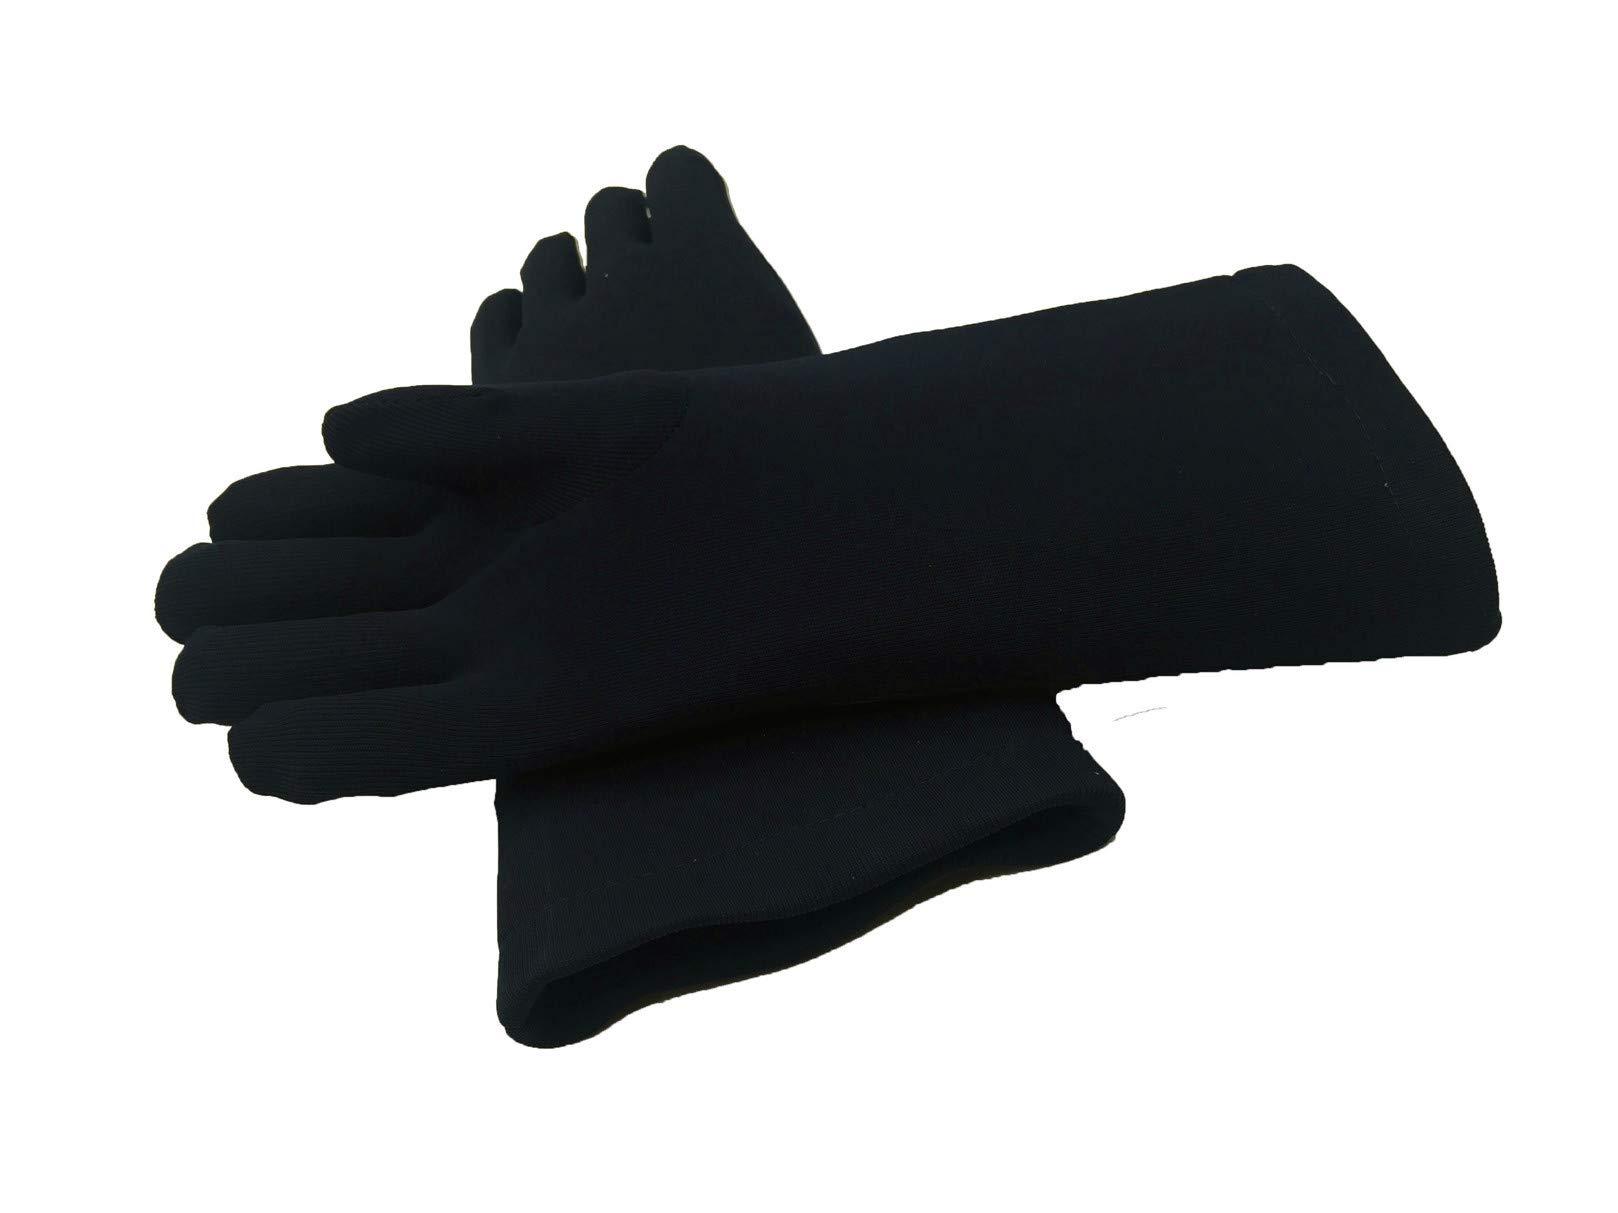 X-ray Protective Gloves,0.5mmpb,Radiation Safety Leaded Gloves for X-Ray MRI CT Radiation Protection